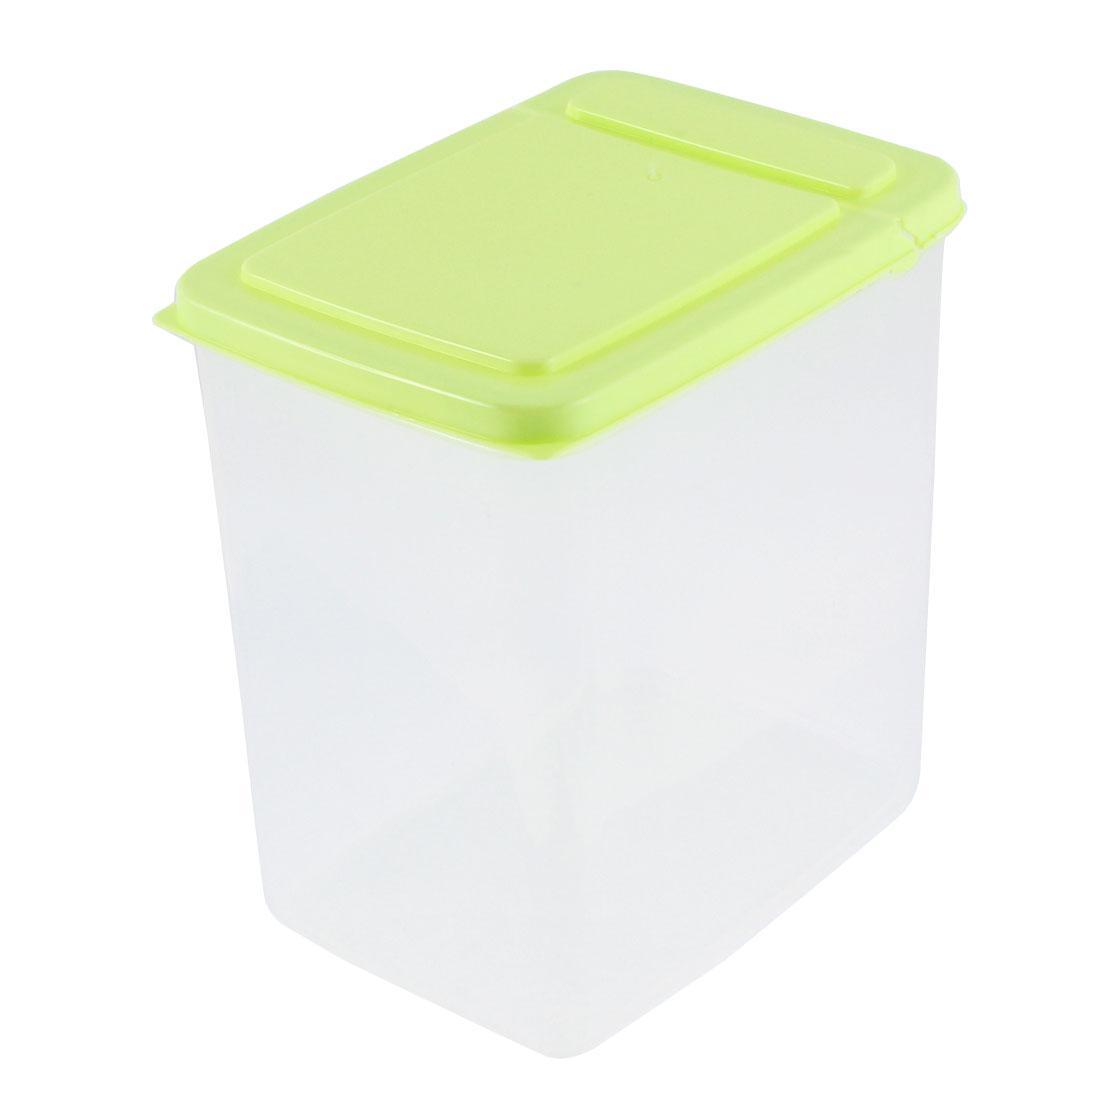 Office Plastic Food Storage Case Container 15cm x 11cm x 16cm 2L Green